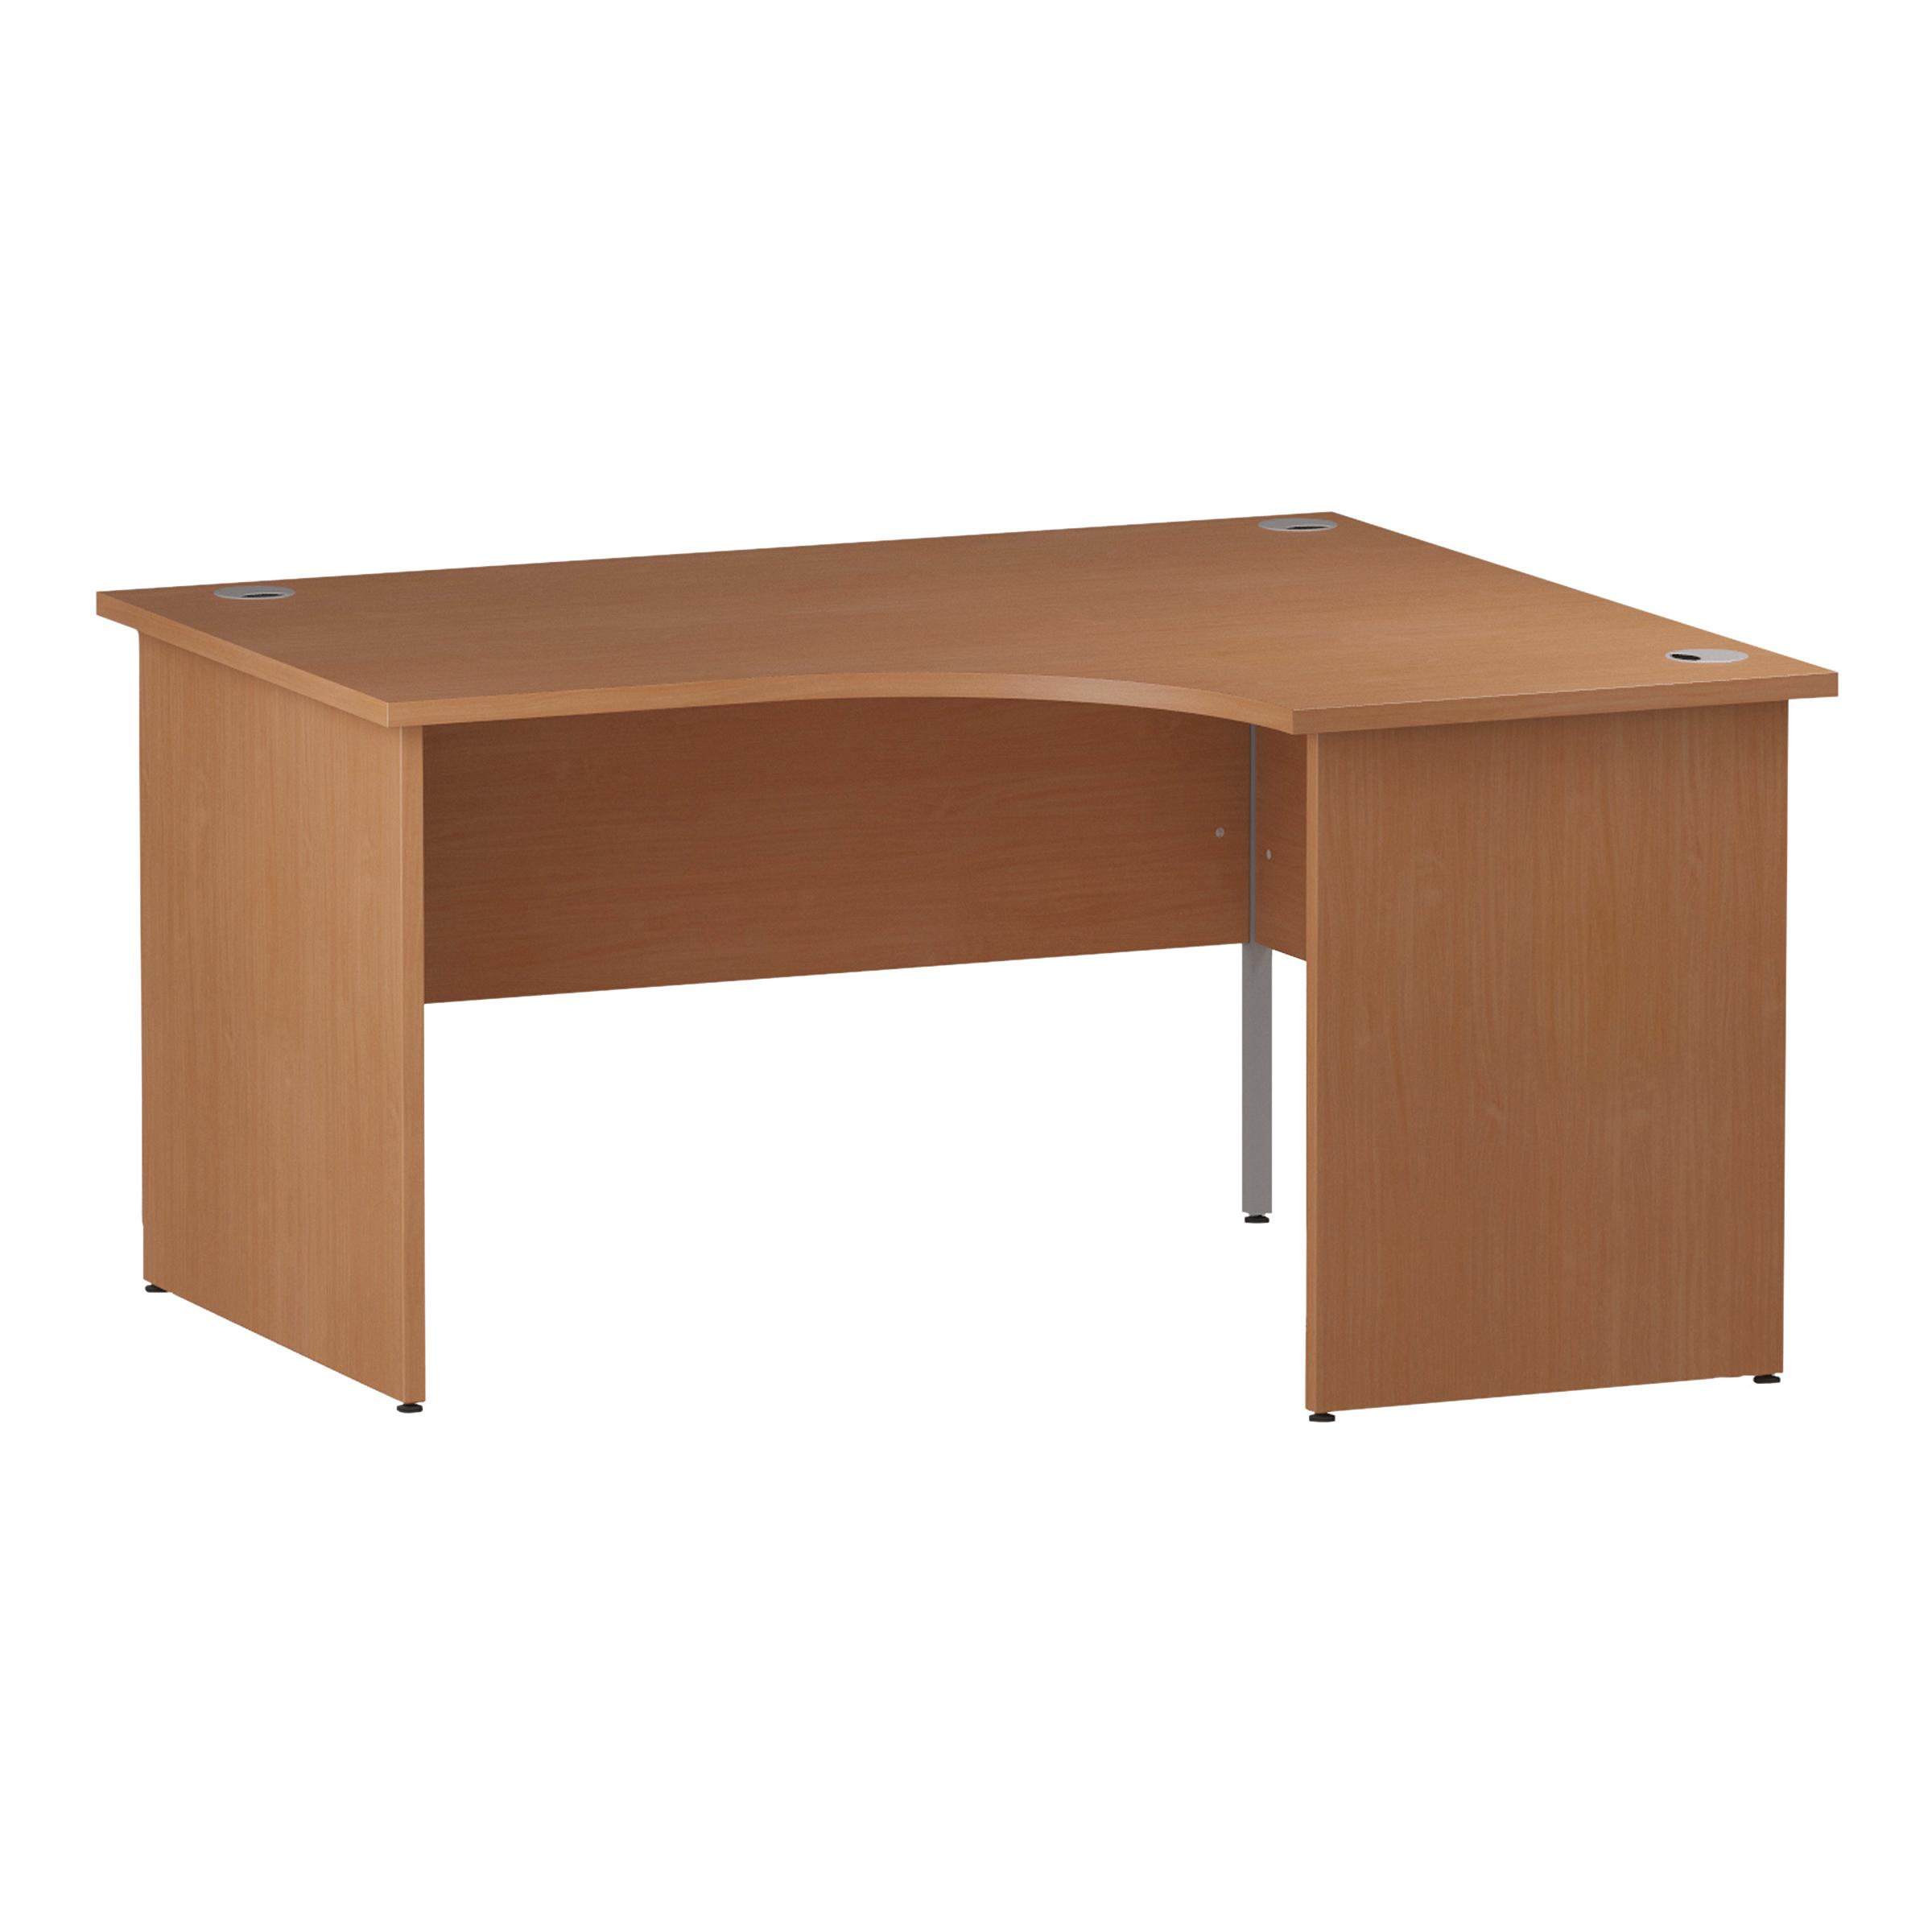 Trexus Radial Desk Right Hand Panel End Leg 1600/1200mm Beech Ref I000388